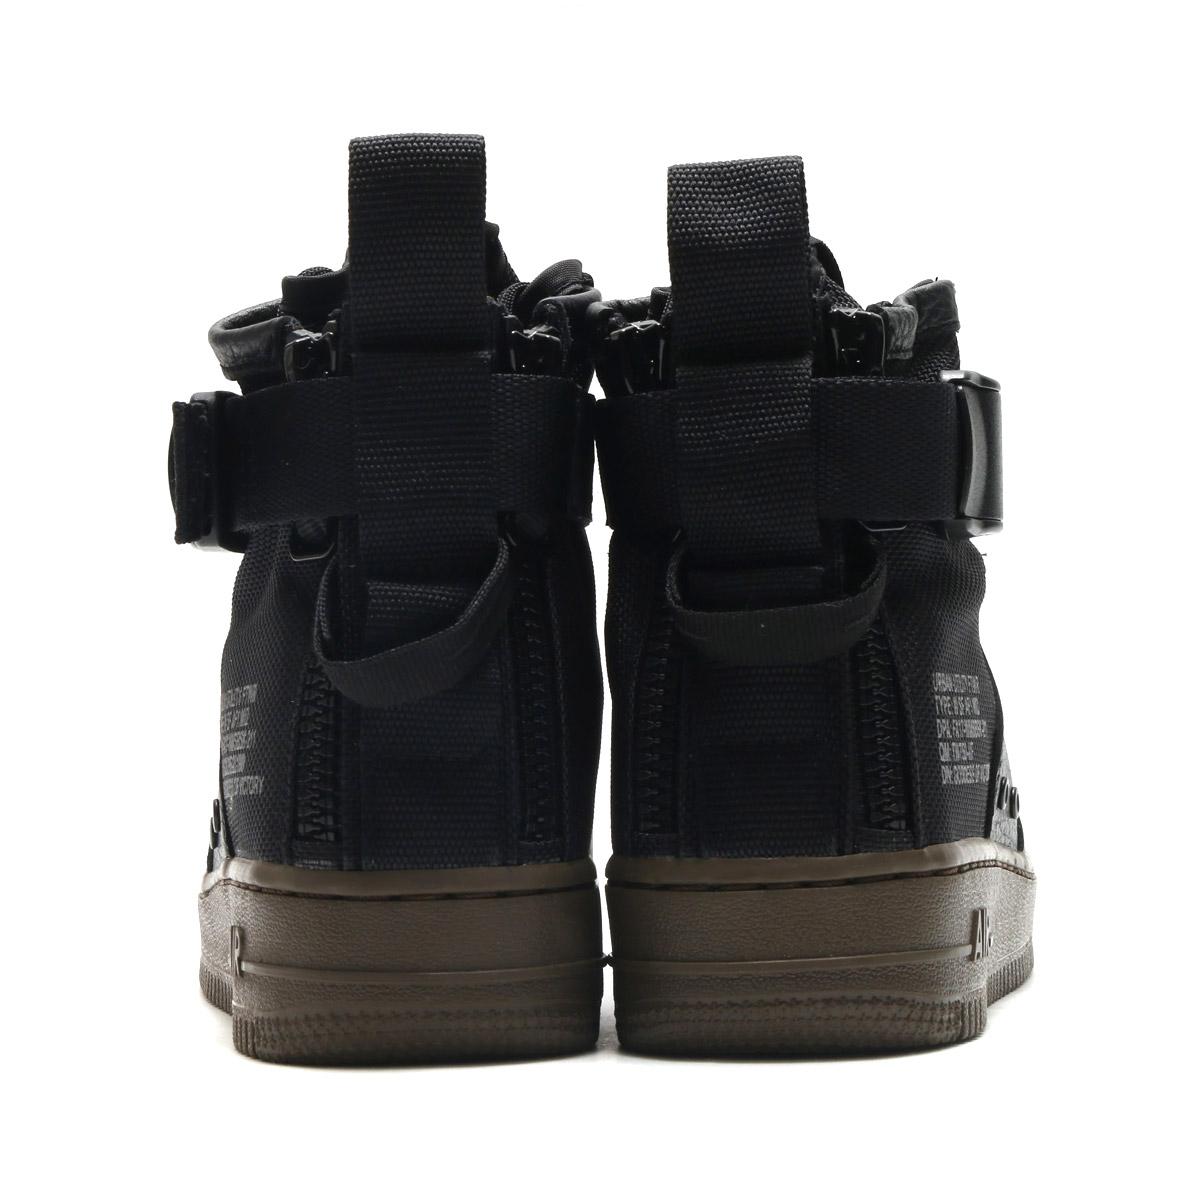 da82072c6aa623 NIKE W SF AF1 MID (Nike women special field air force 1 mid) (BLACK BLACK-DARK  HAZEL) 17FA-S